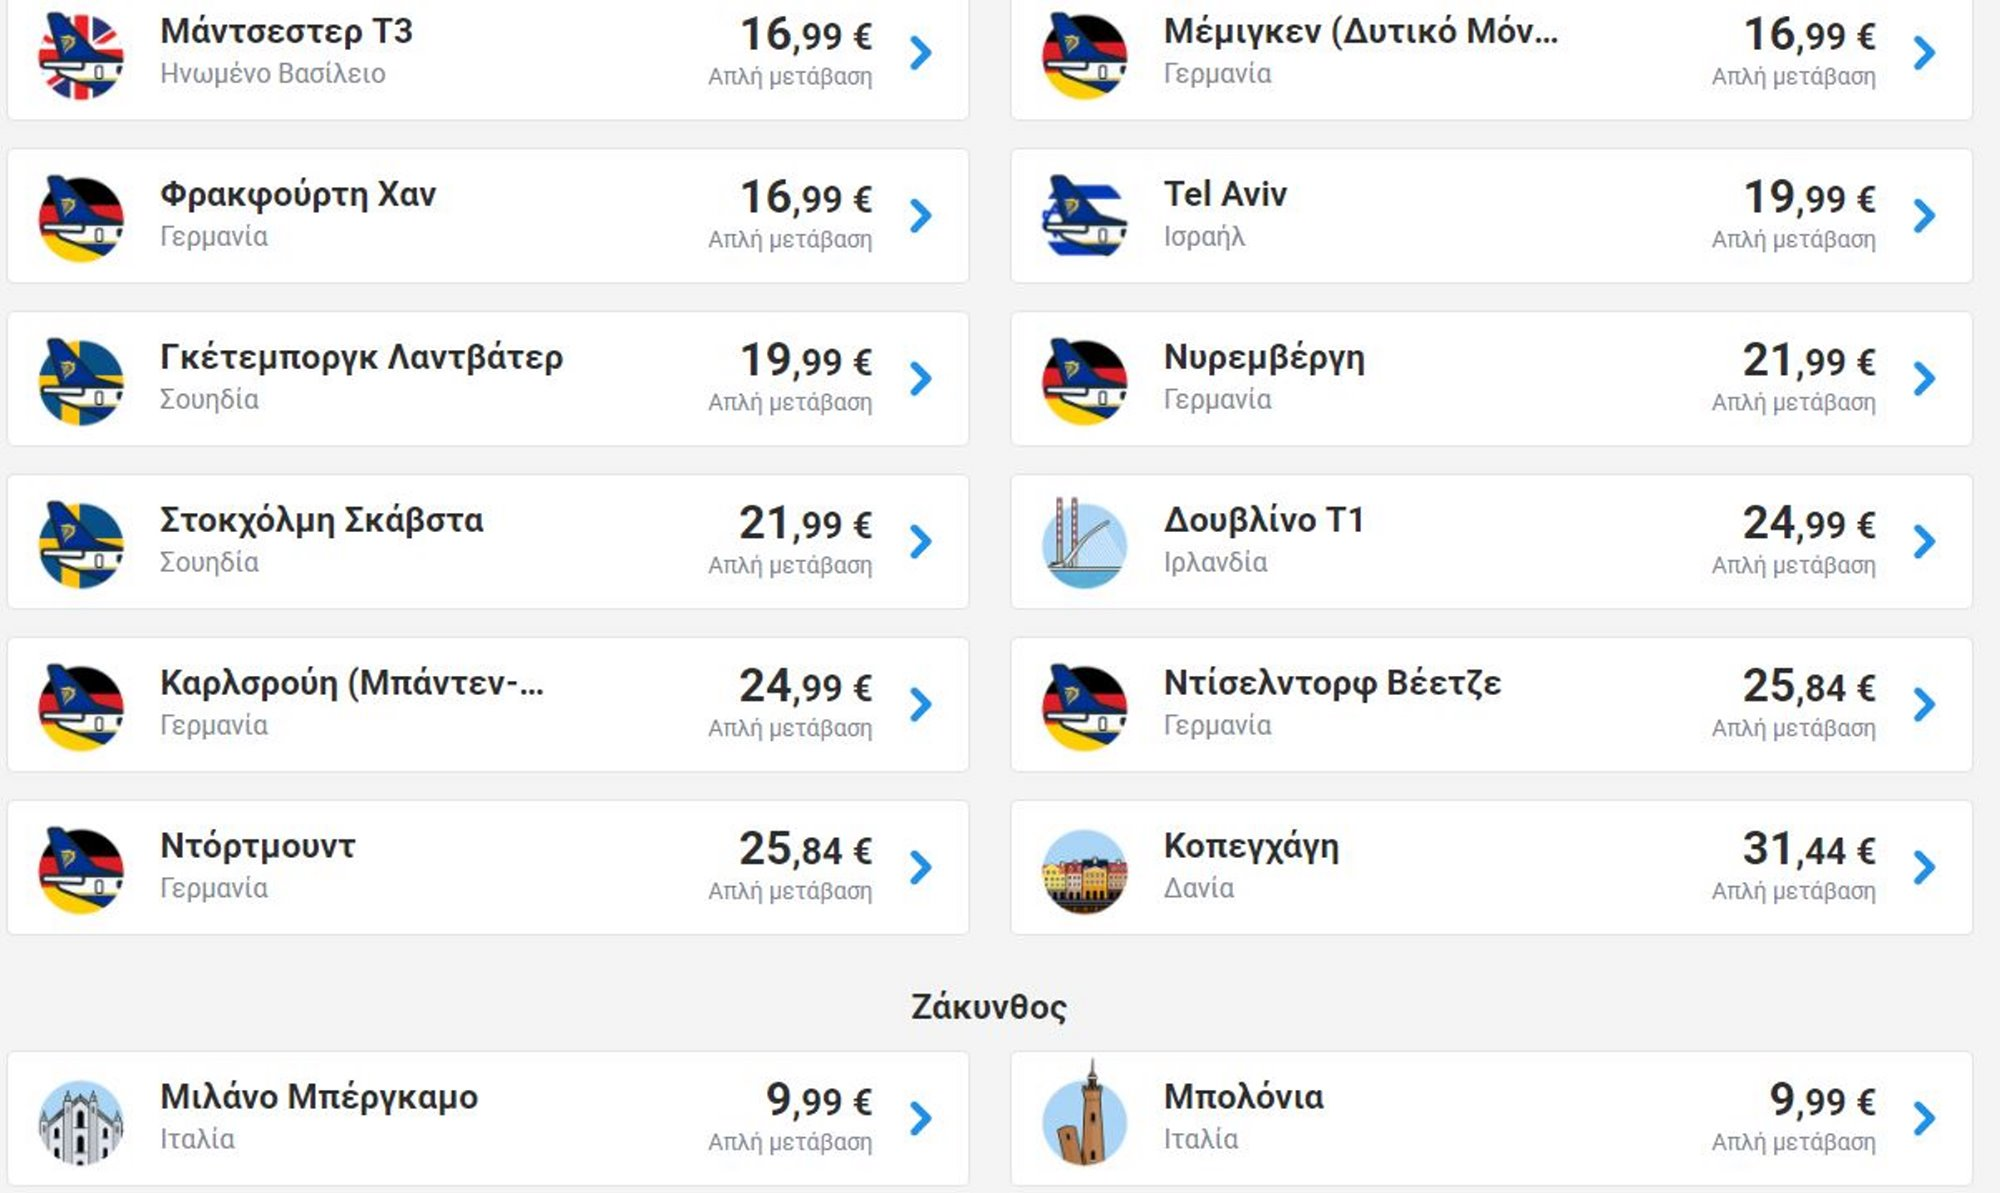 Ryanair: Κάντε κράτηση μέχρι 09/09 και ταξιδέψτε στο εξωτερικό από €9,99!